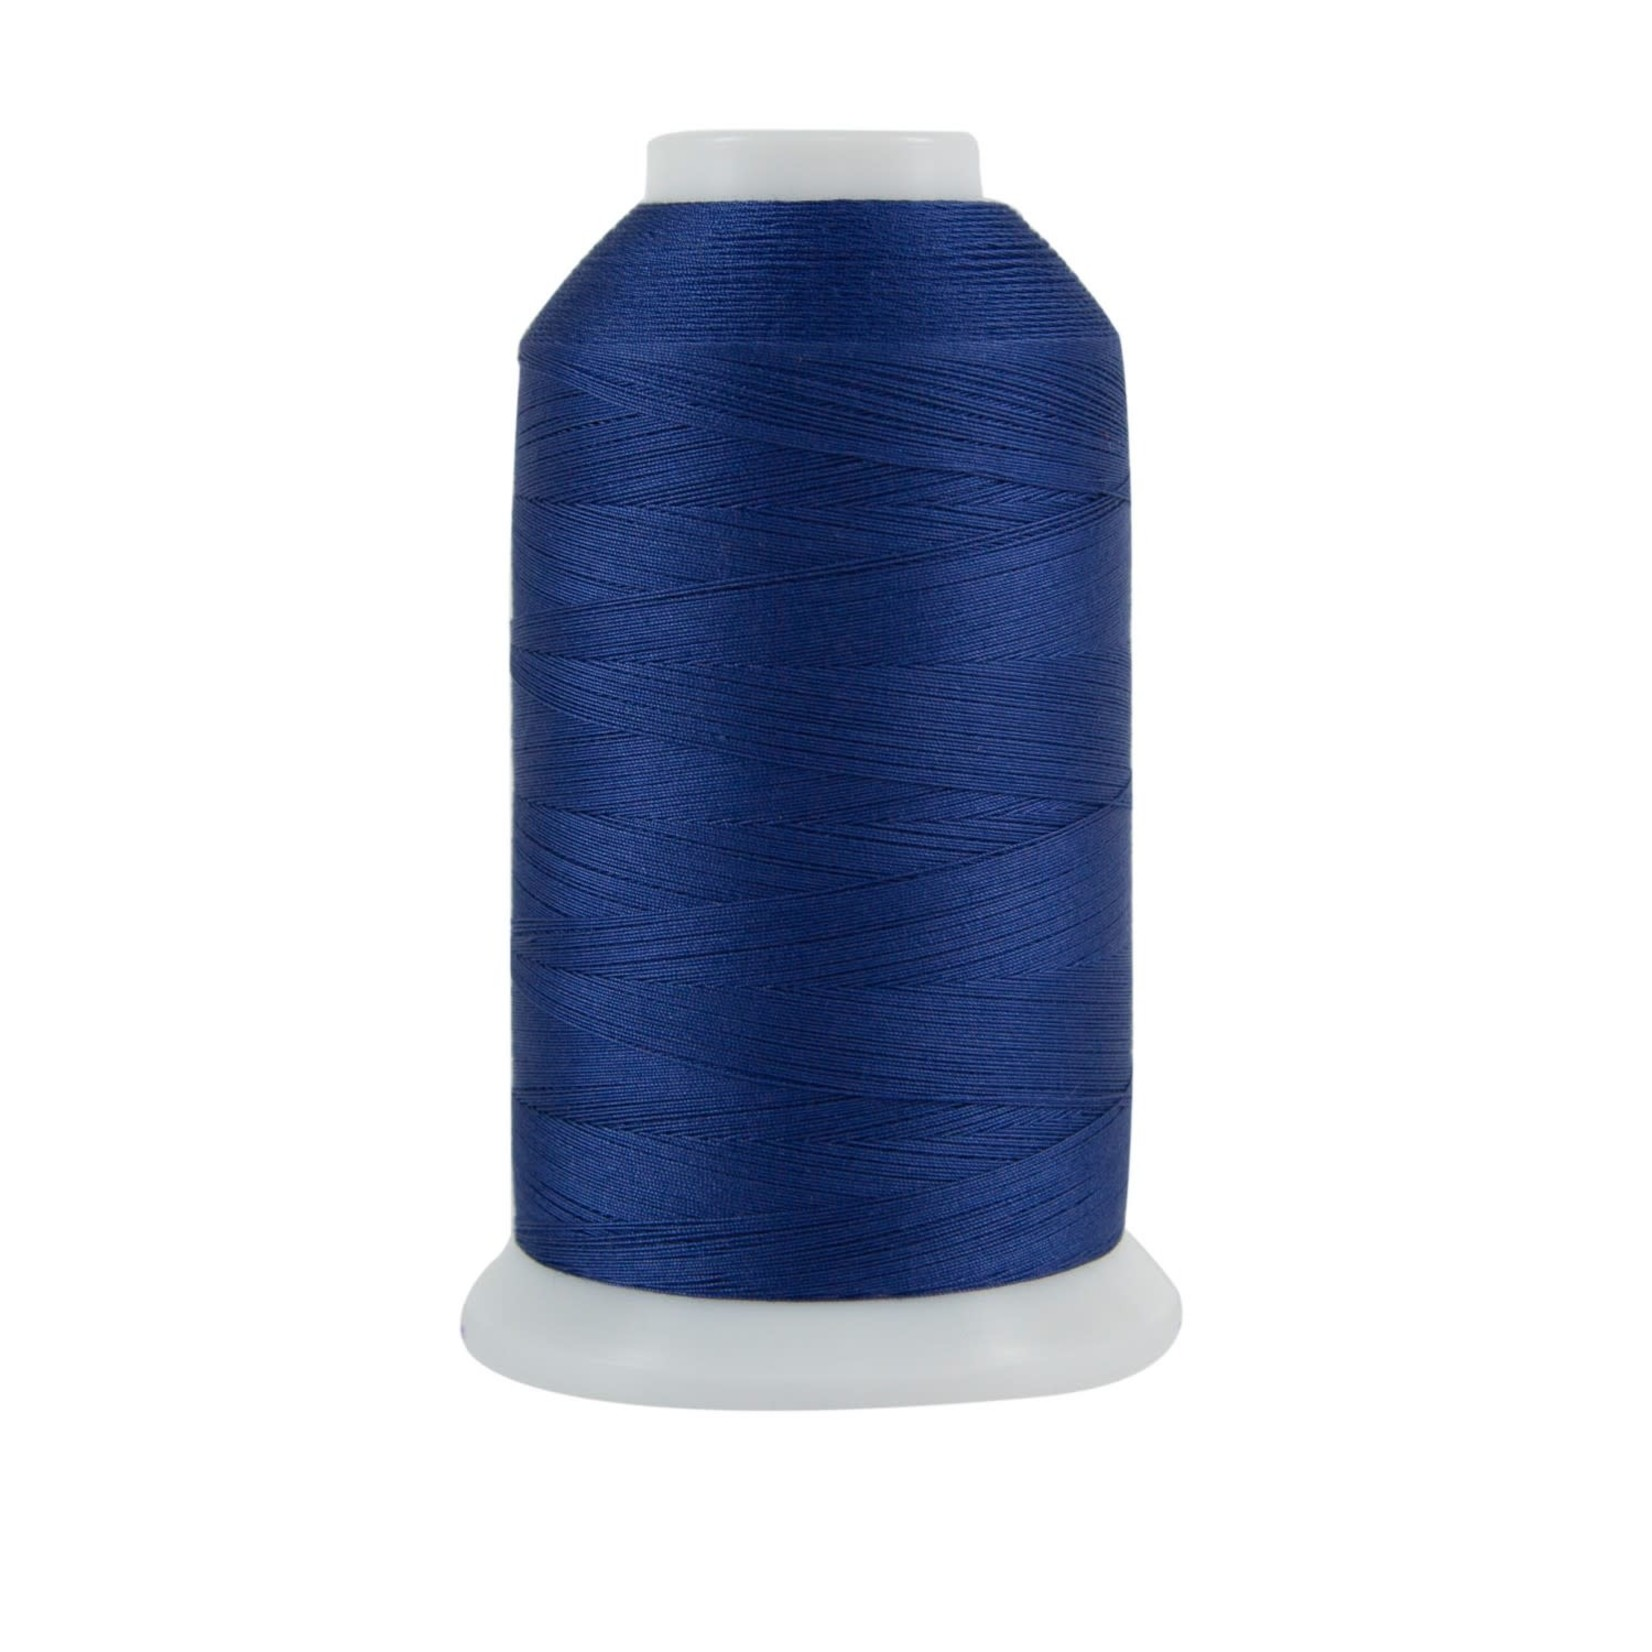 Superior Threads King Tut - #40 - 1828 m - 1031 Edwardian Blue